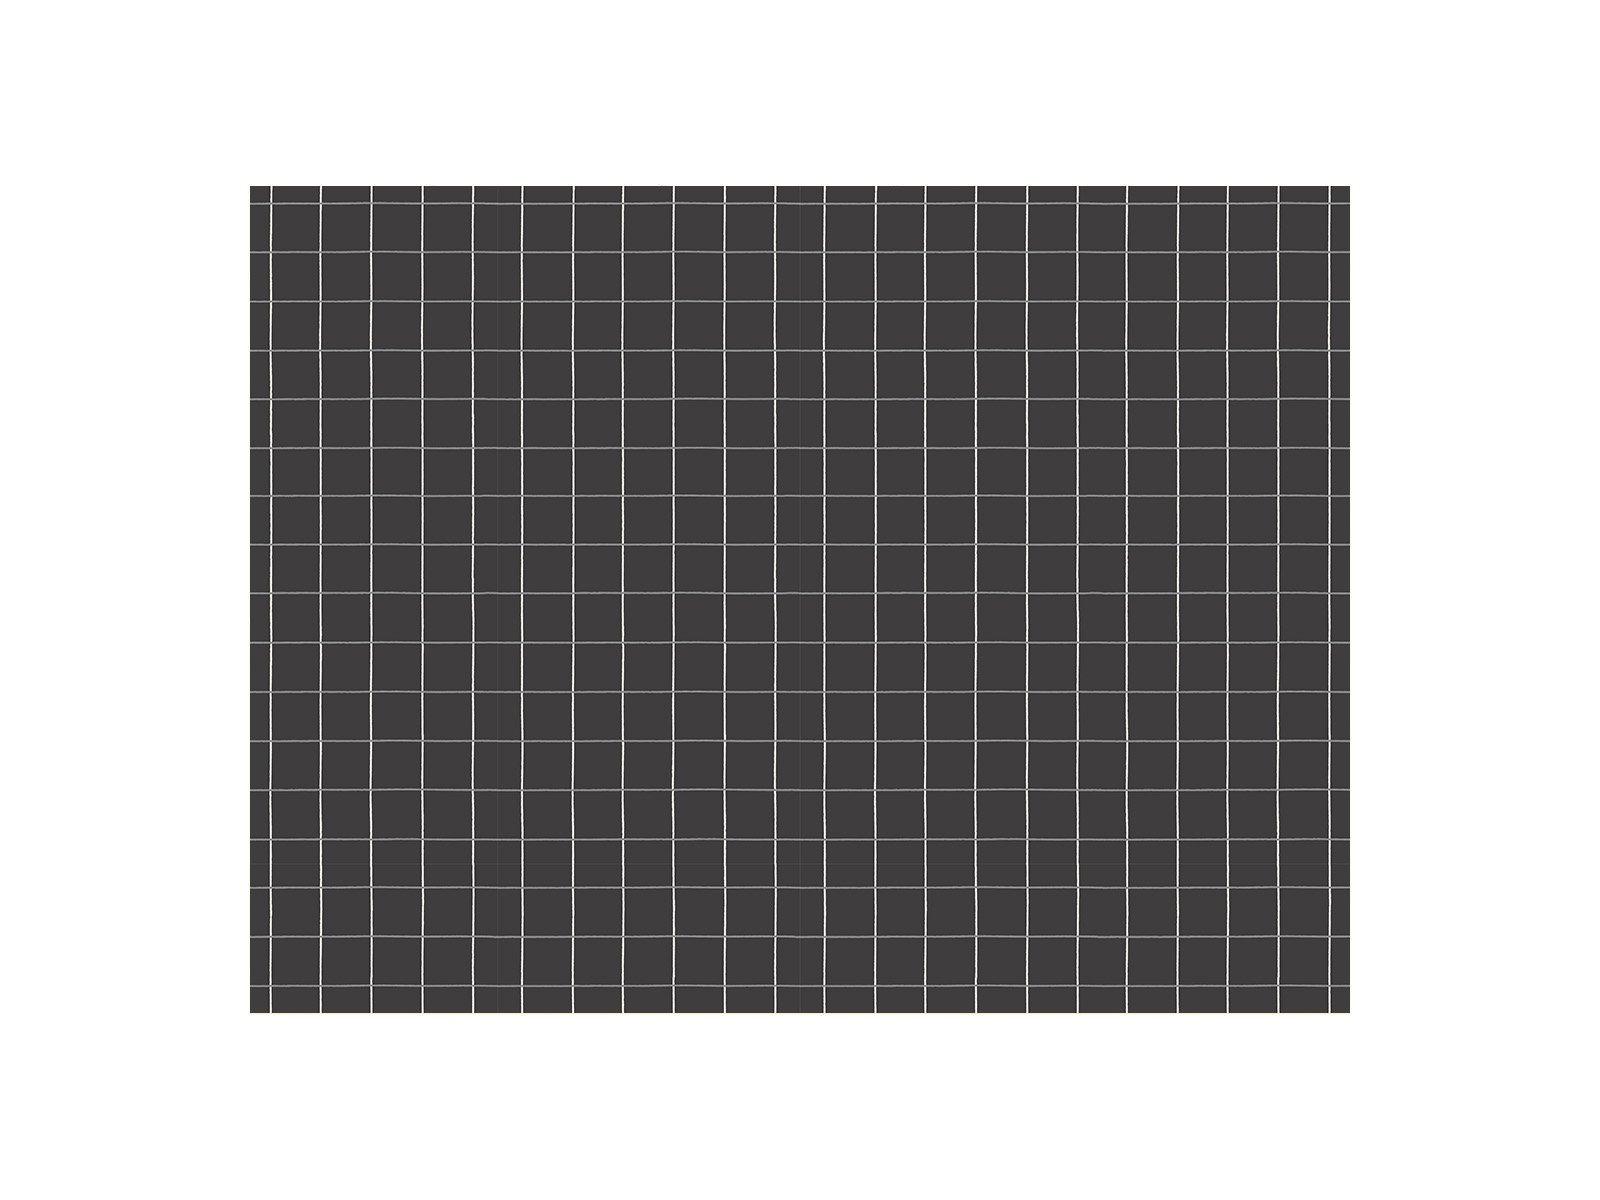 Crossy Wallpaper